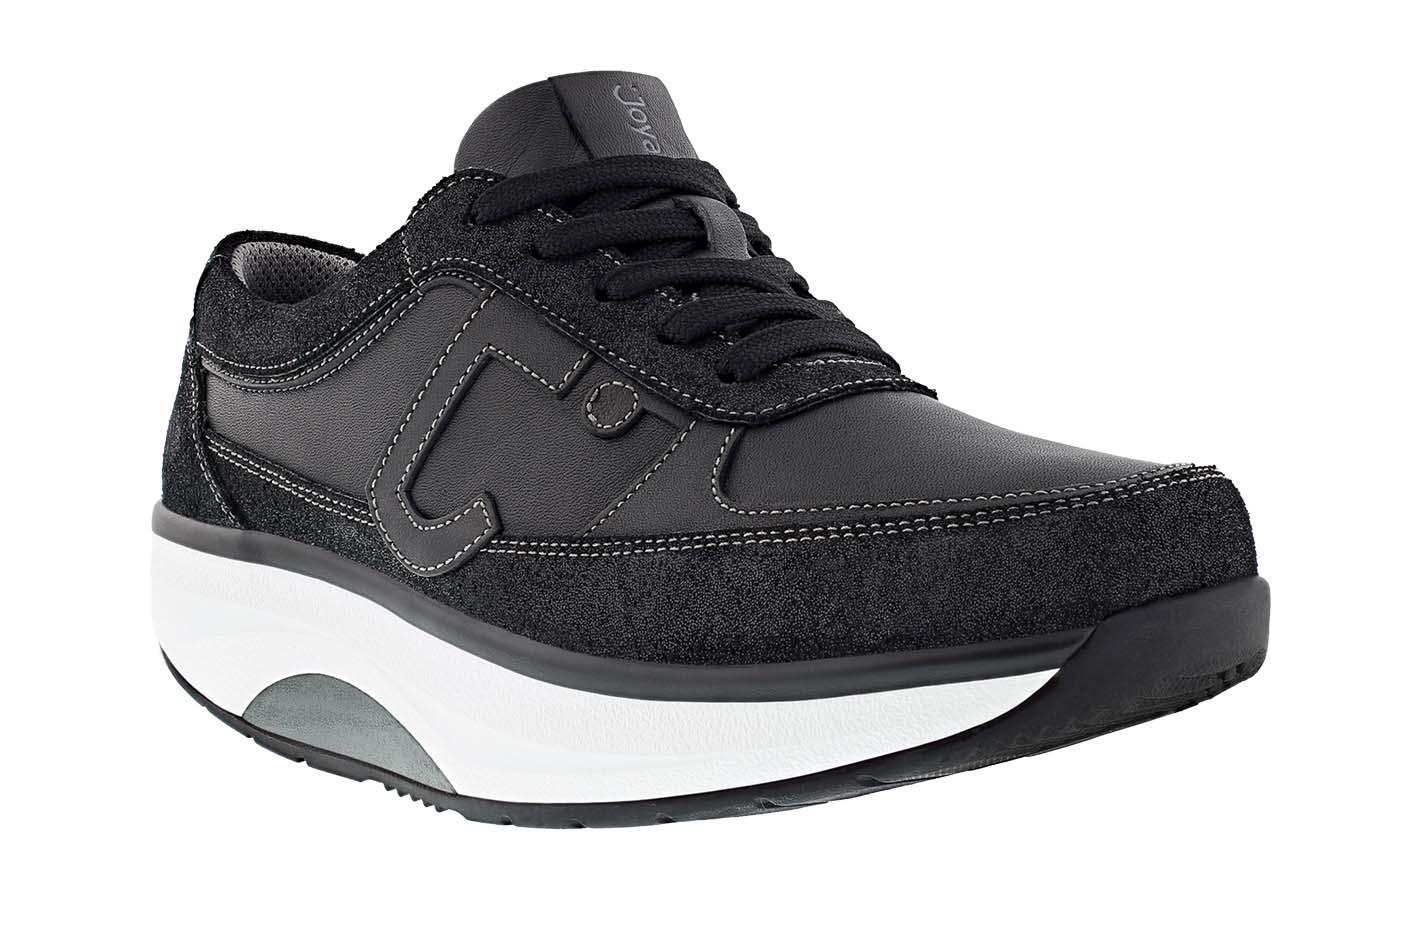 separation shoes be1c6 94568 Joya ID Casual W Zebra Gr.41